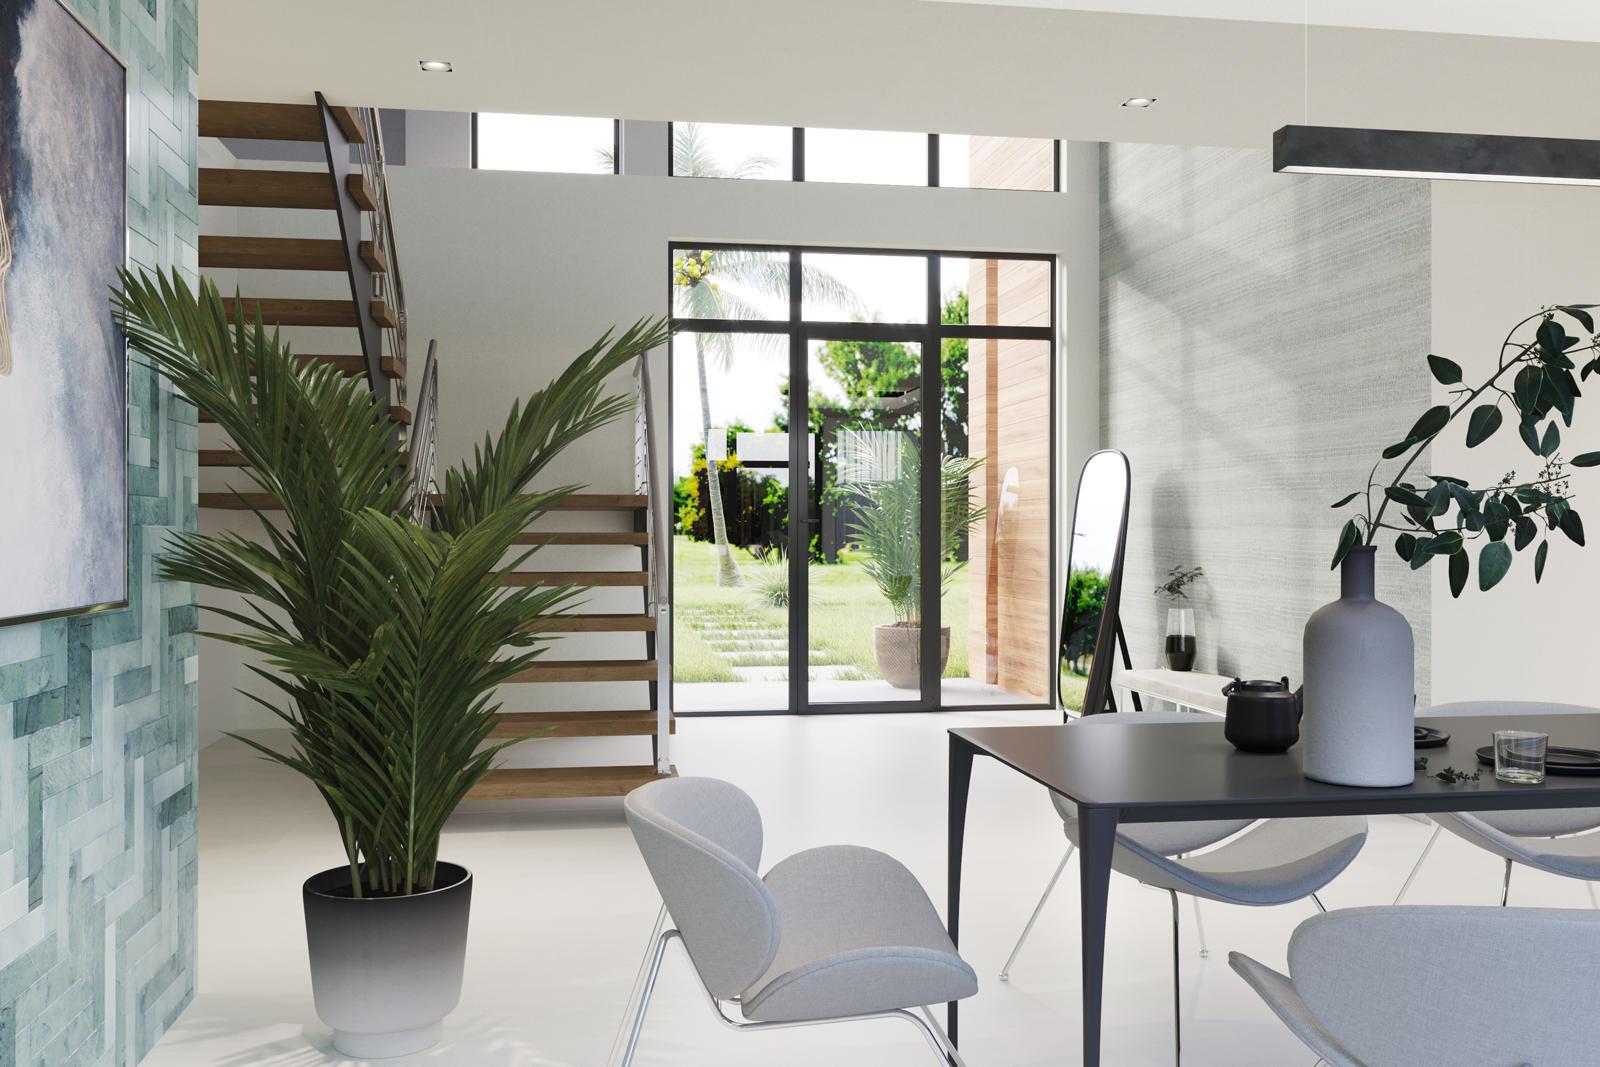 Westwood_Homes_622___630622_Westwood_liv